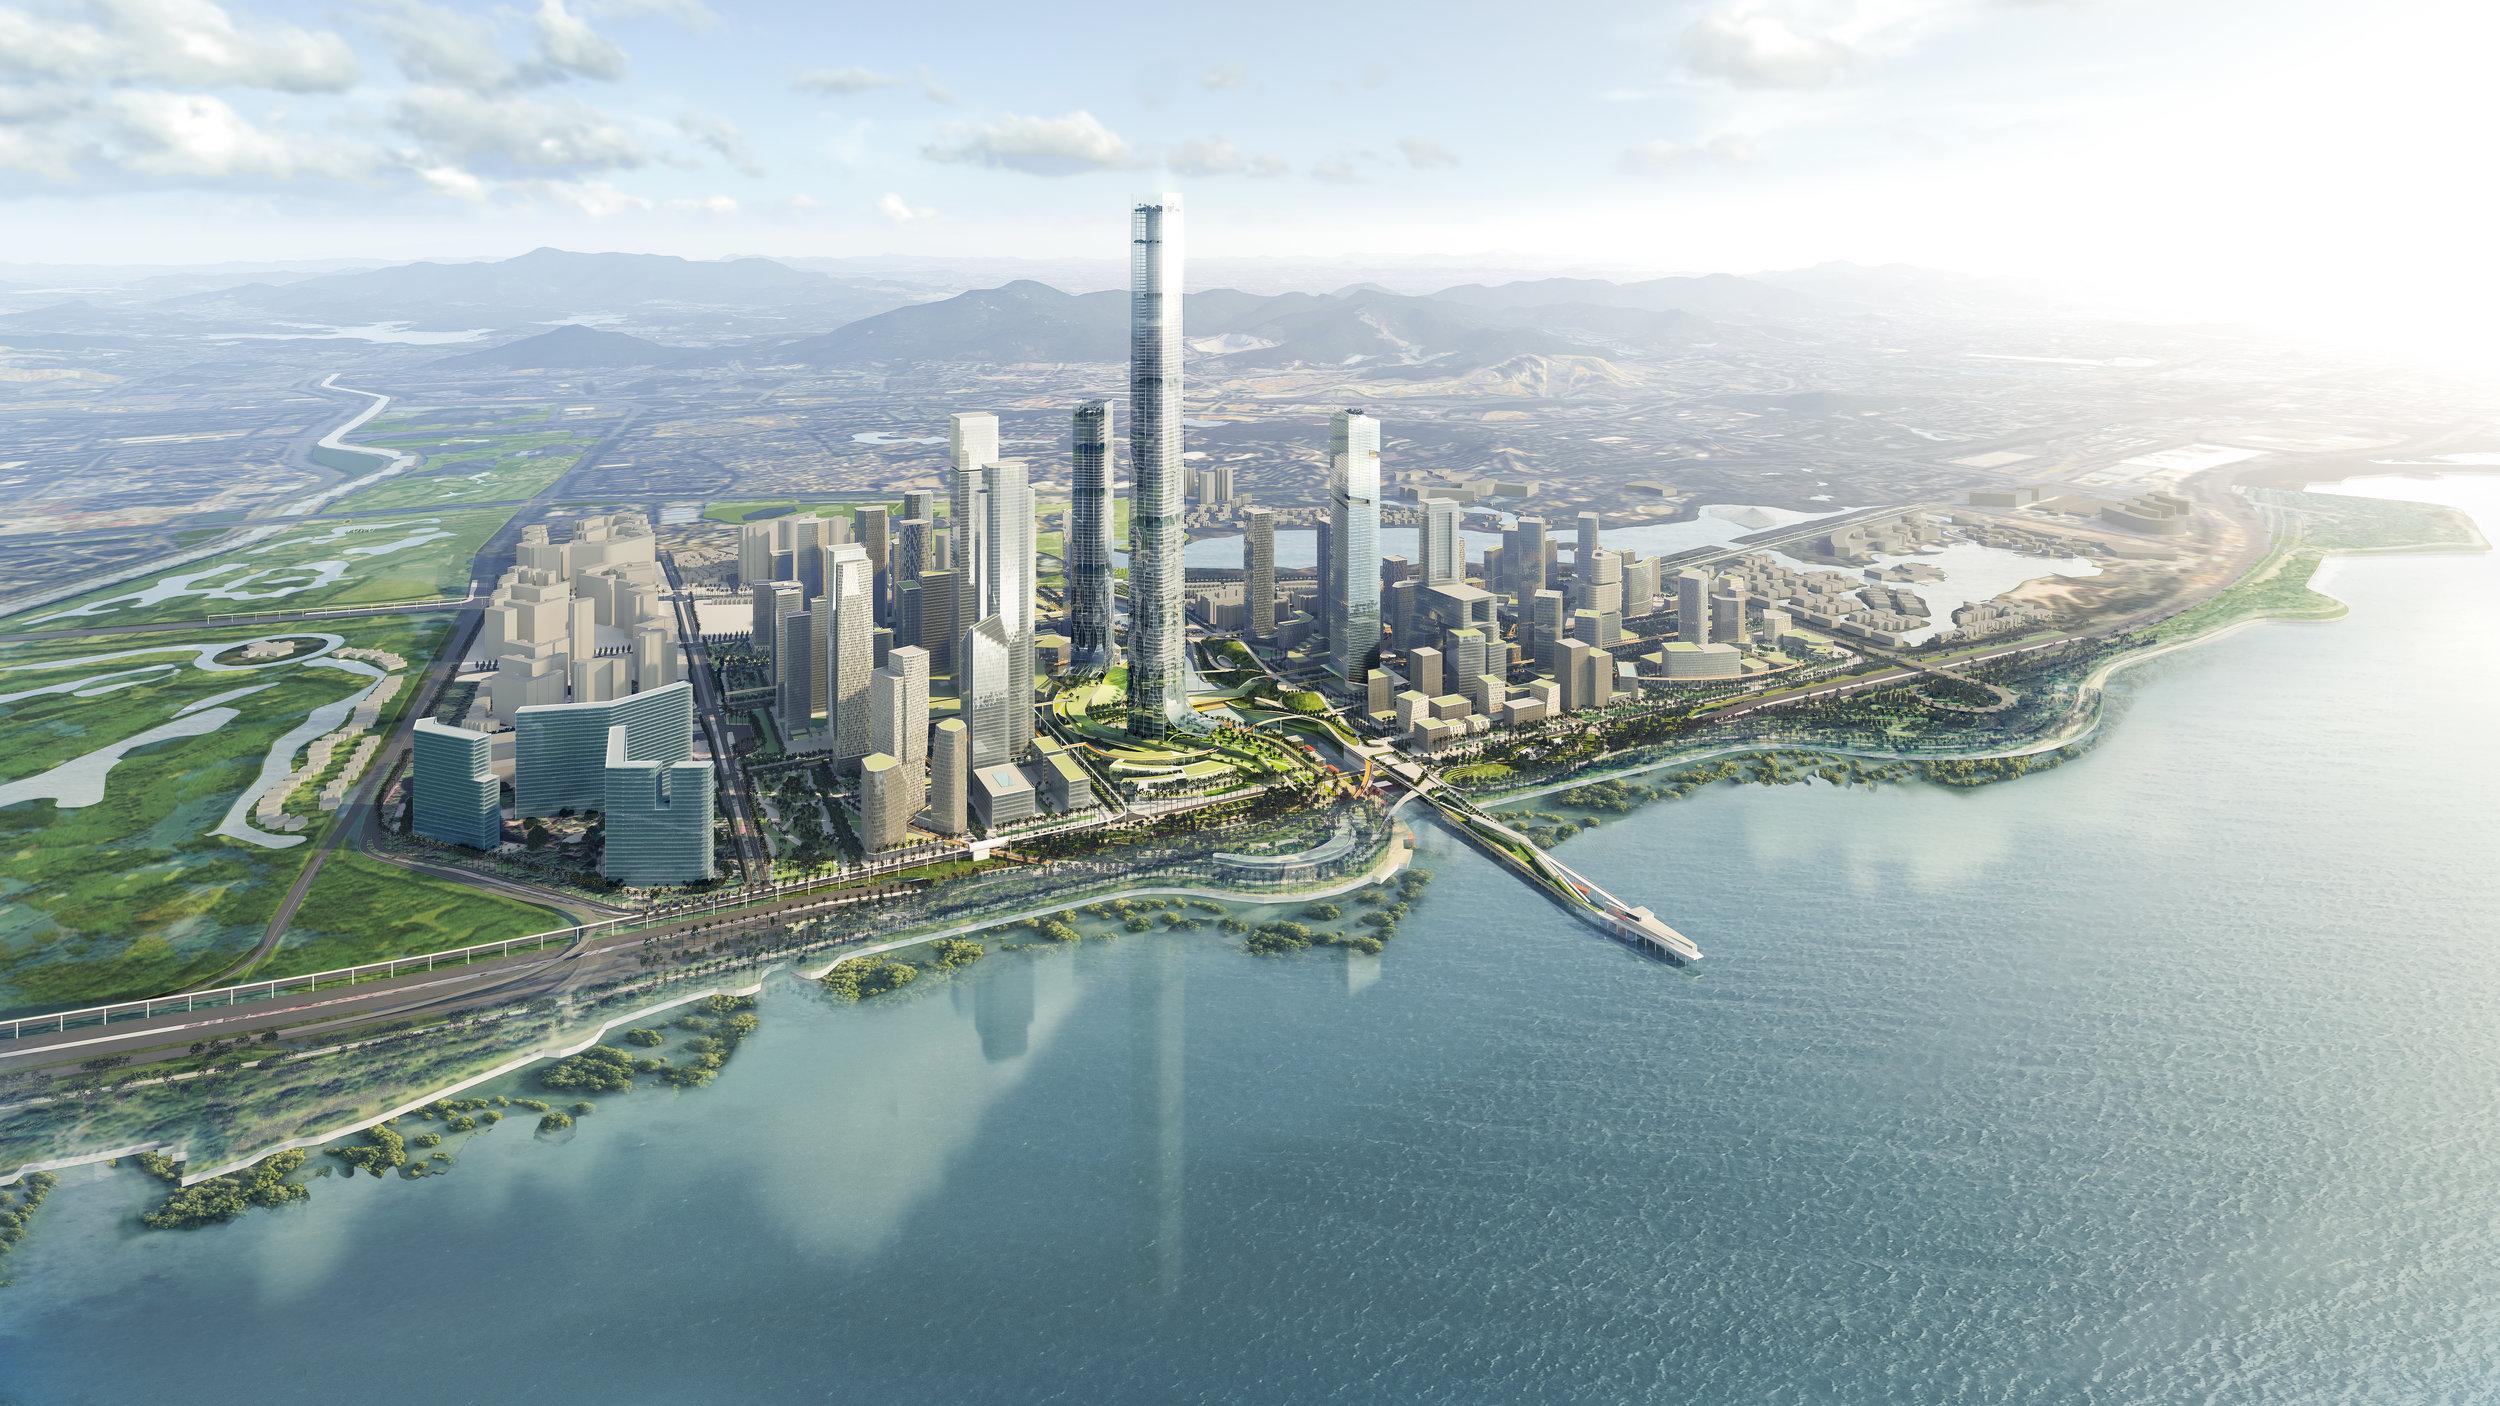 ....SHENZHEN BAY SUPER HEADQUARTER BASE URBAN DESIGN ..    深圳湾超级总部基地城市设计....